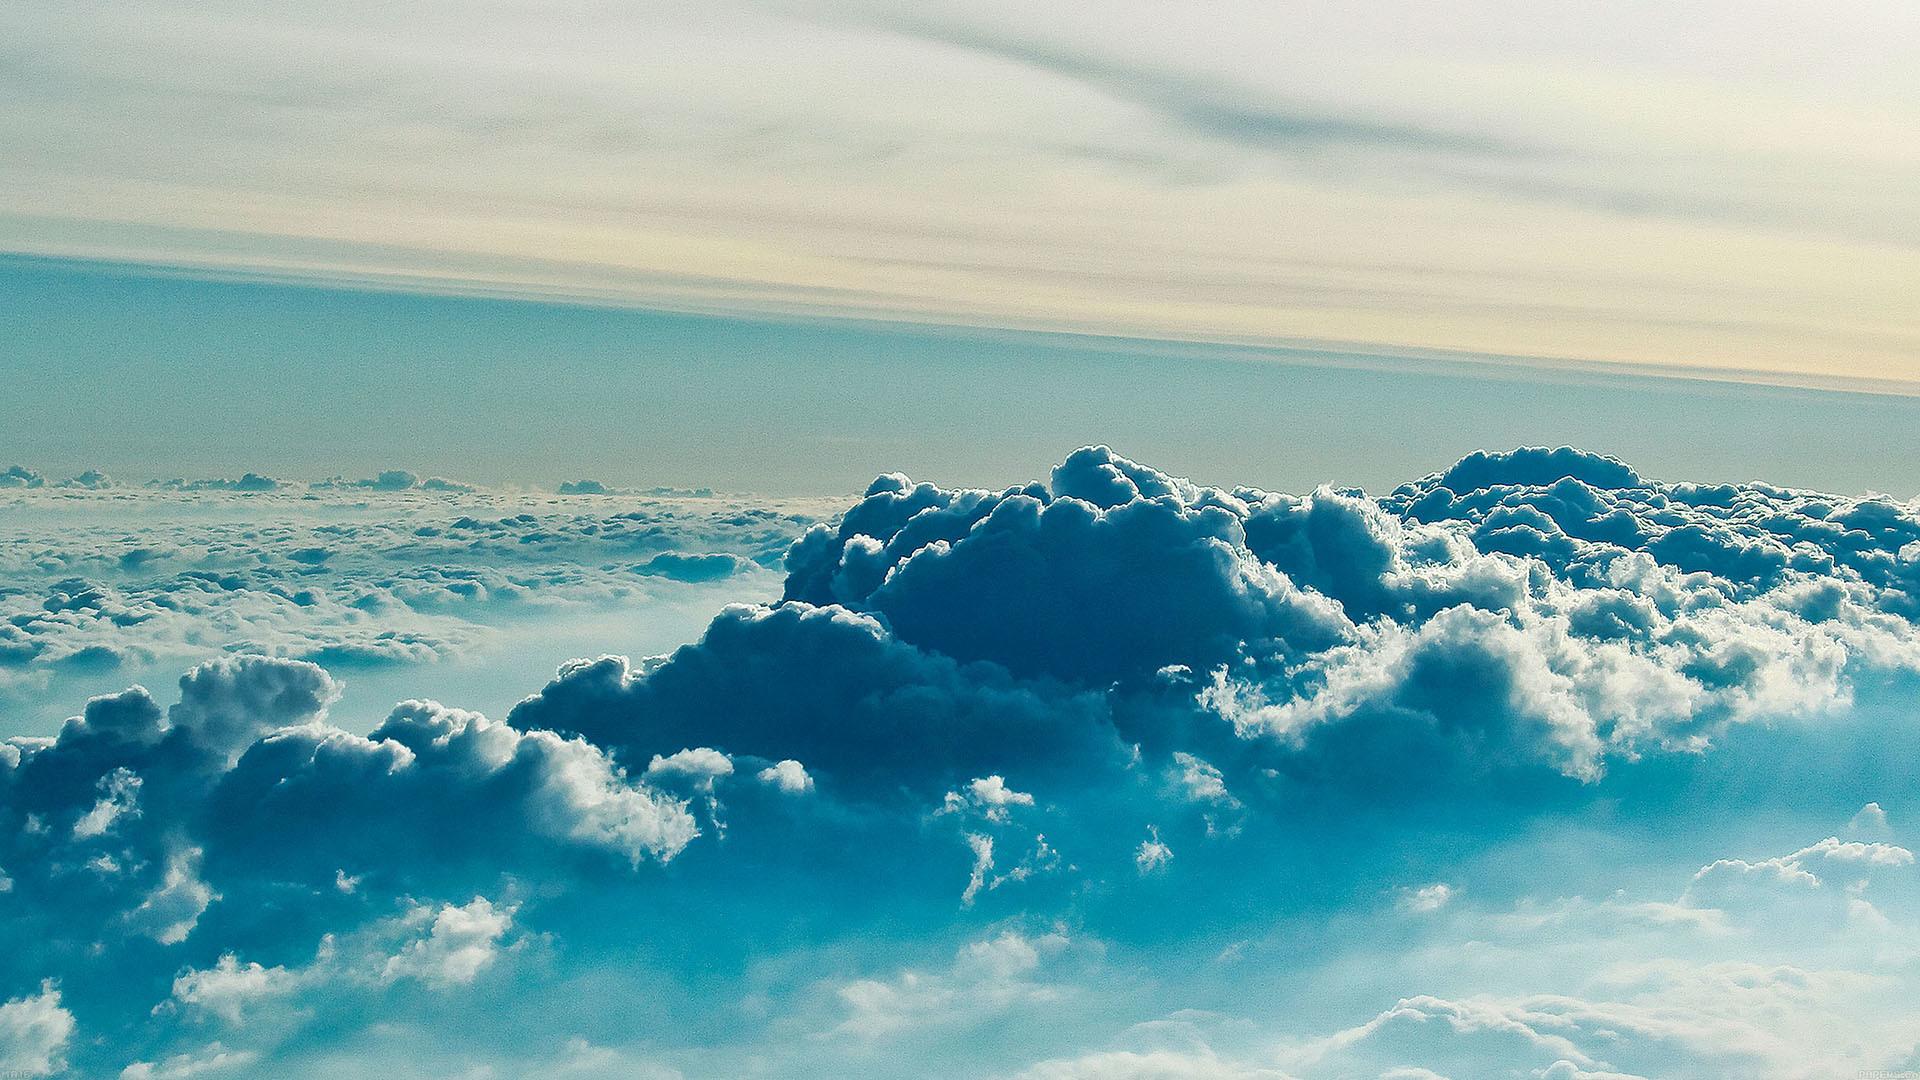 Cloud Desktop Background 62 Images